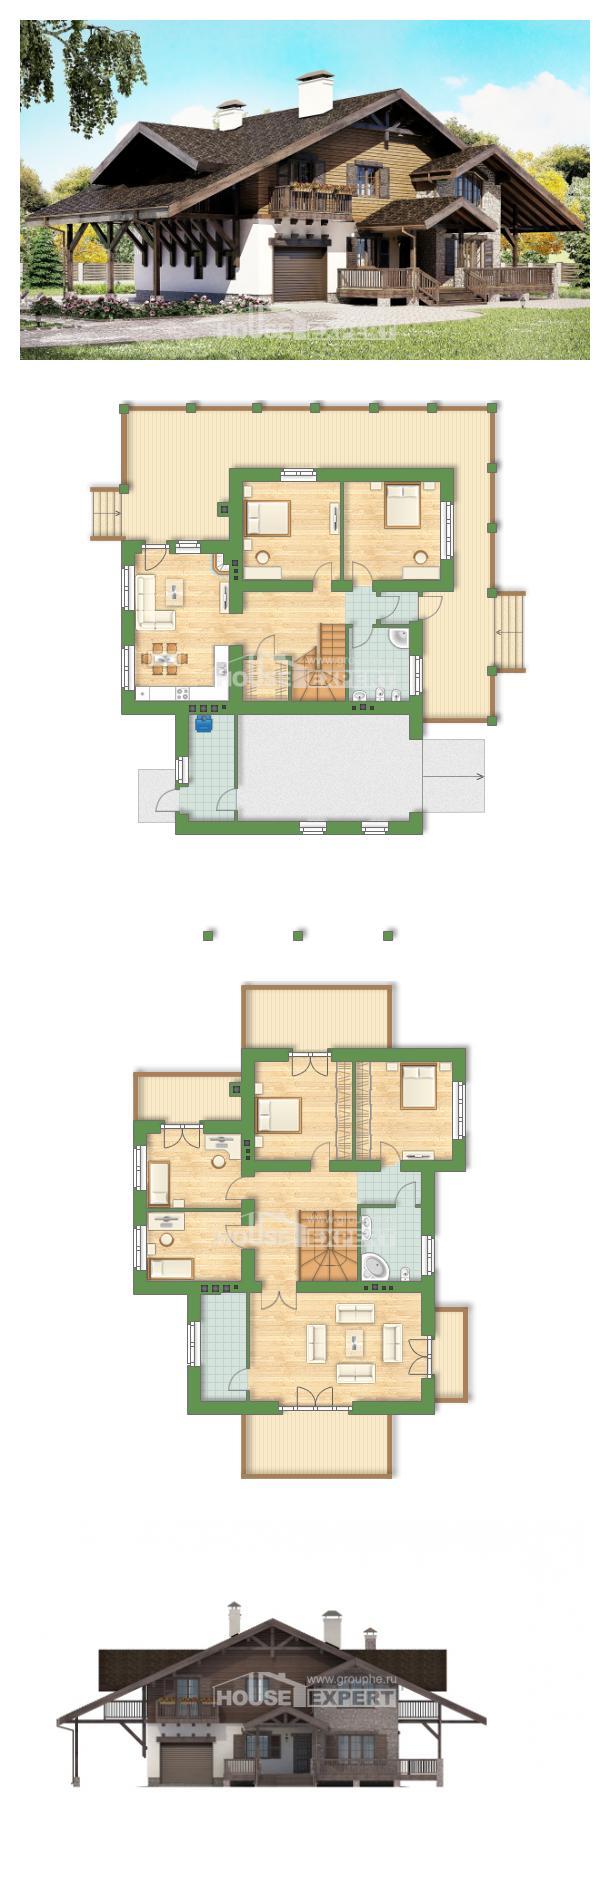 Проект дома 270-001-Л   House Expert